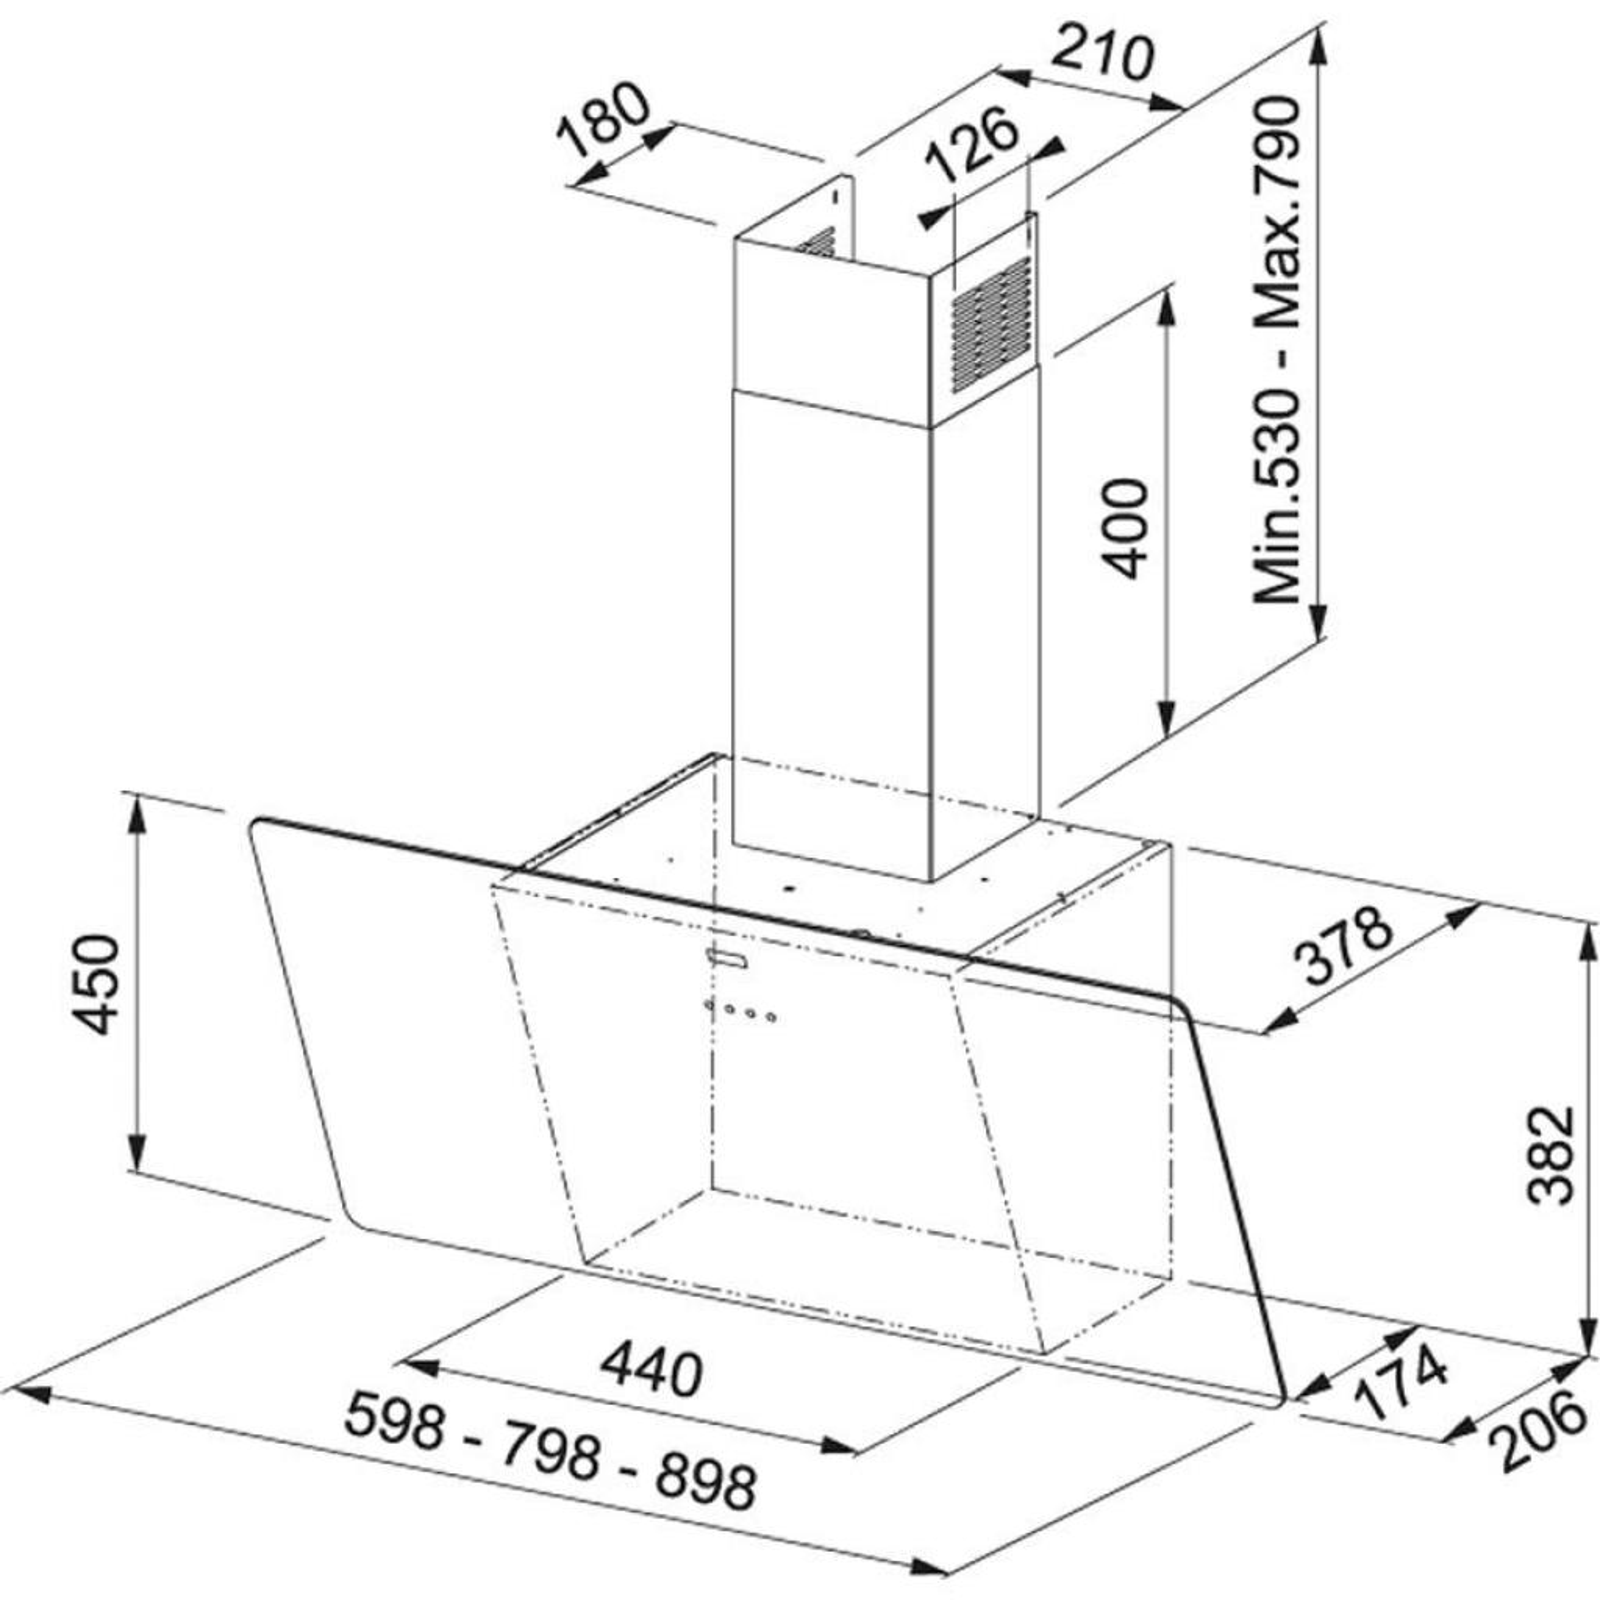 Вытяжка кухонная Franke Vertical Evo FPJ 615 V WH A (110.0361.903) изображение 2